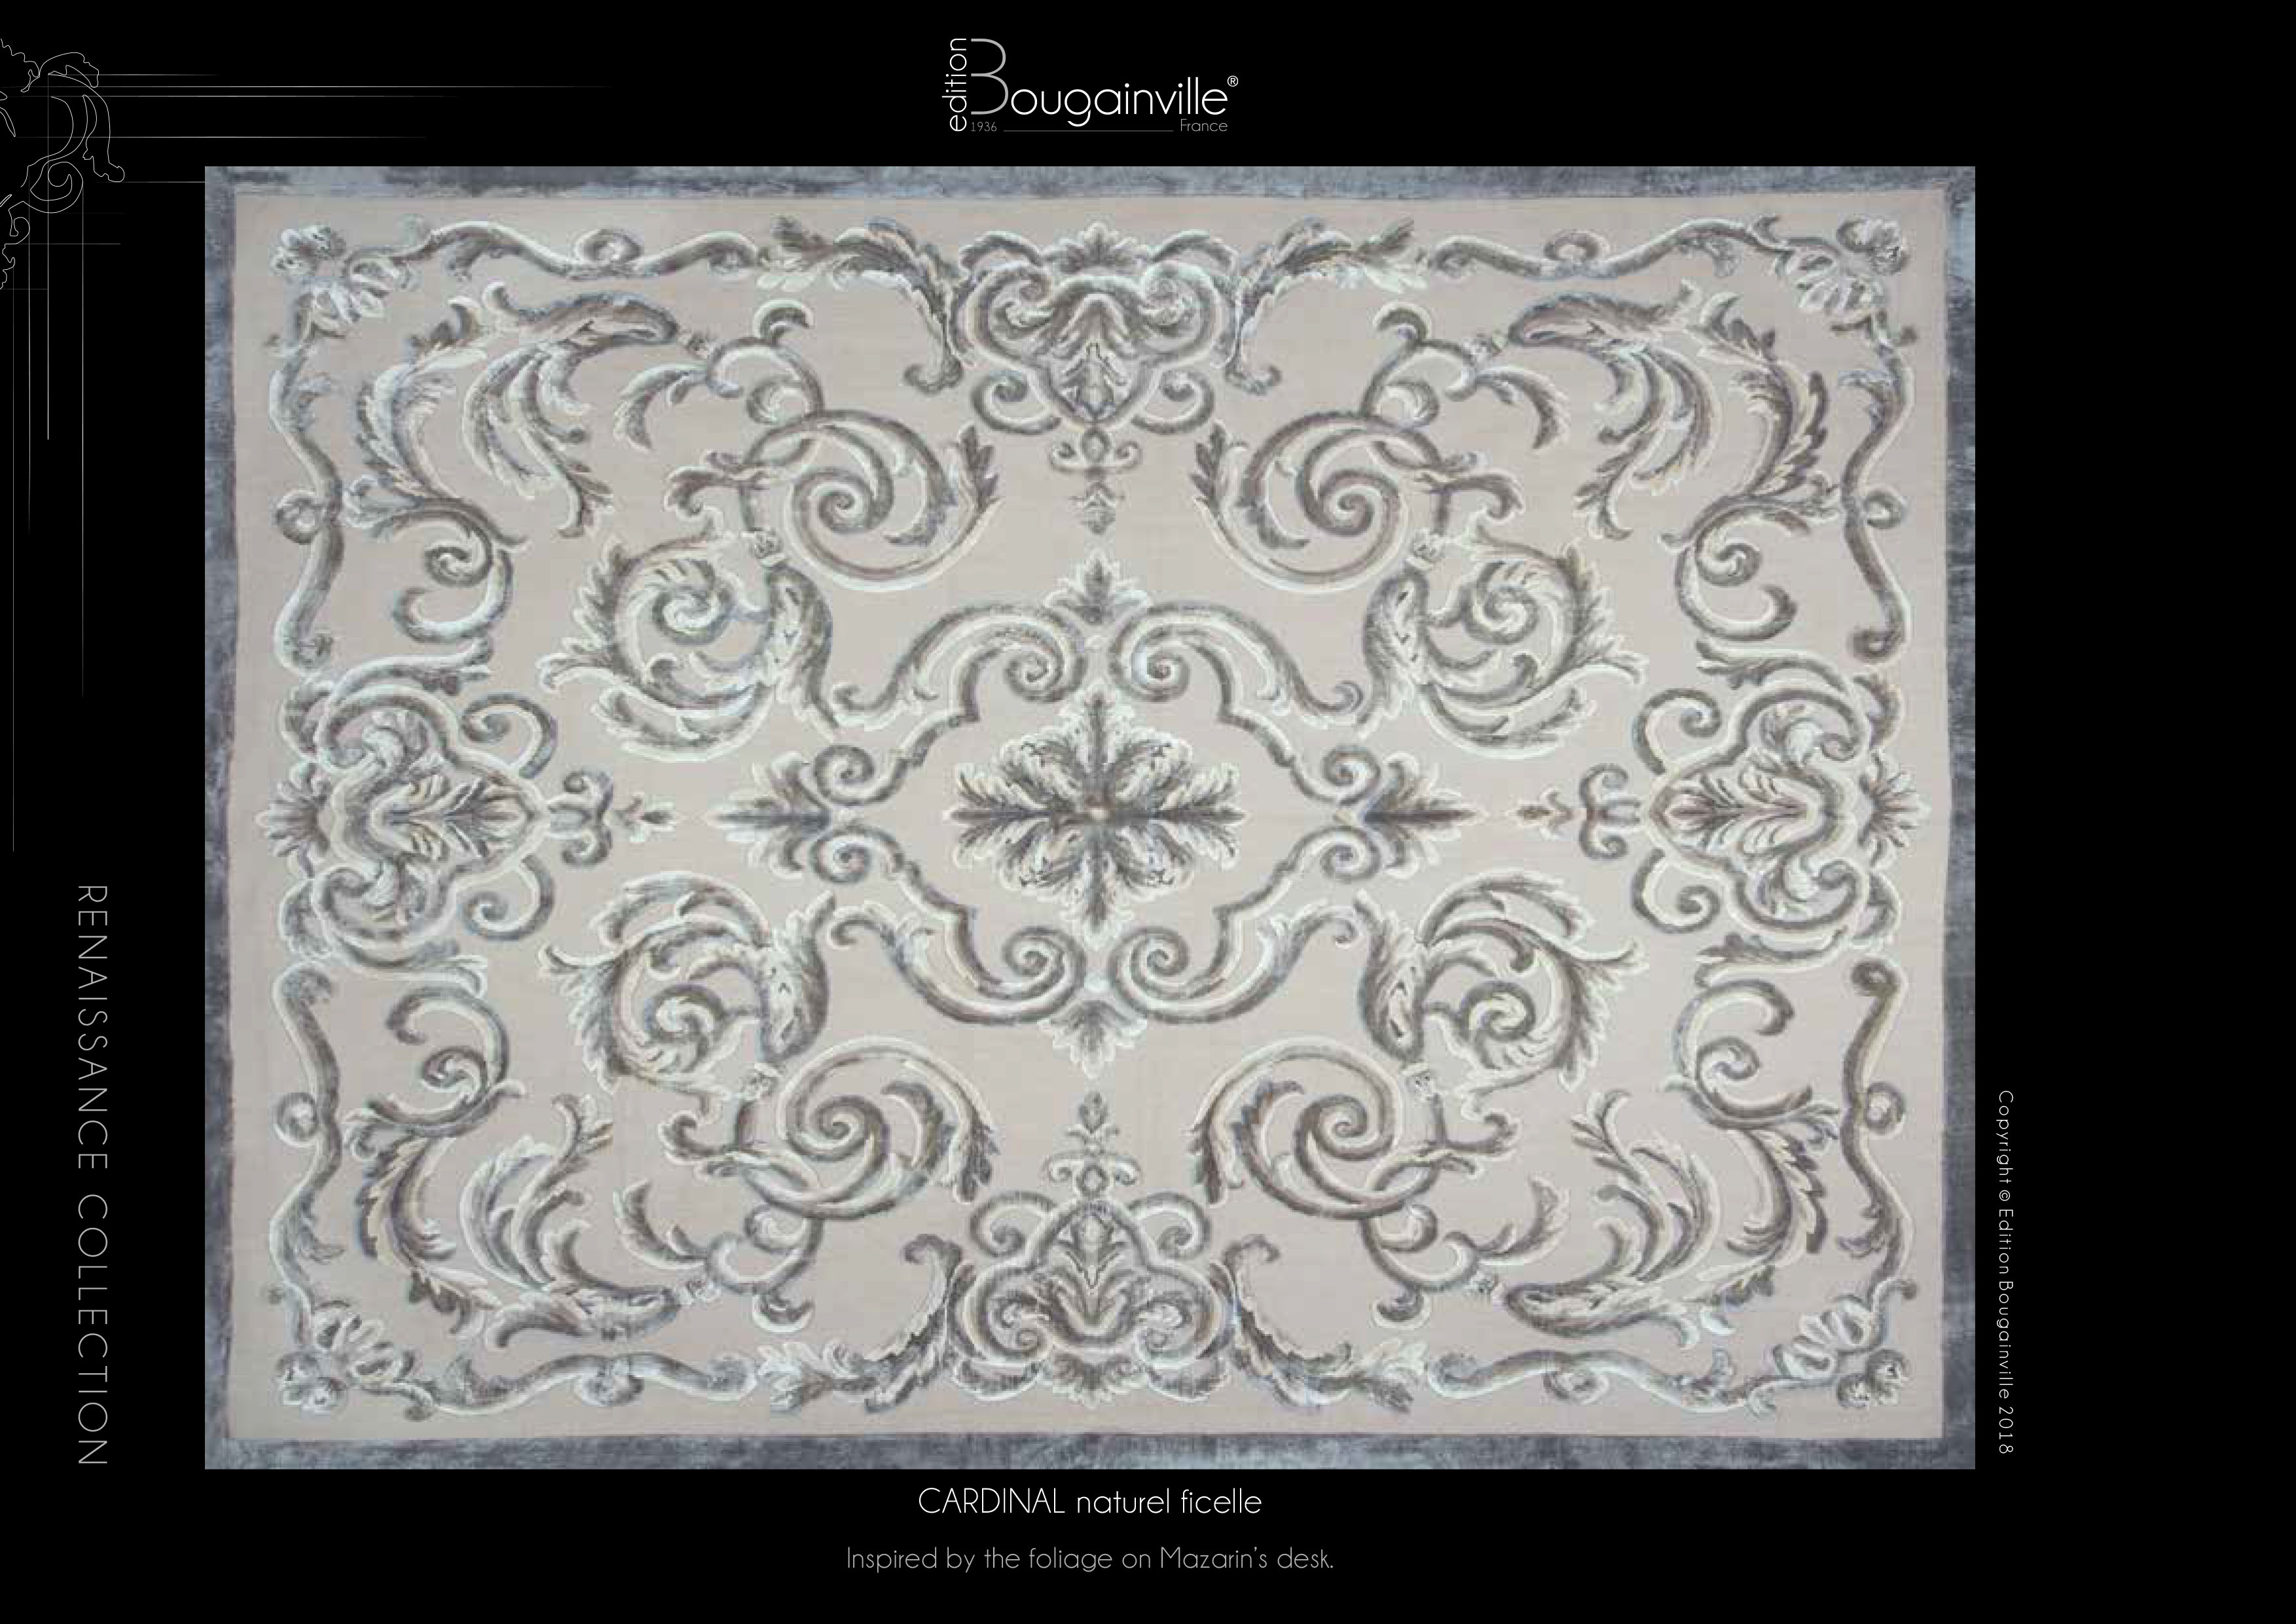 Ковер Edition Bougainville, CARDINAL naturel ficelle